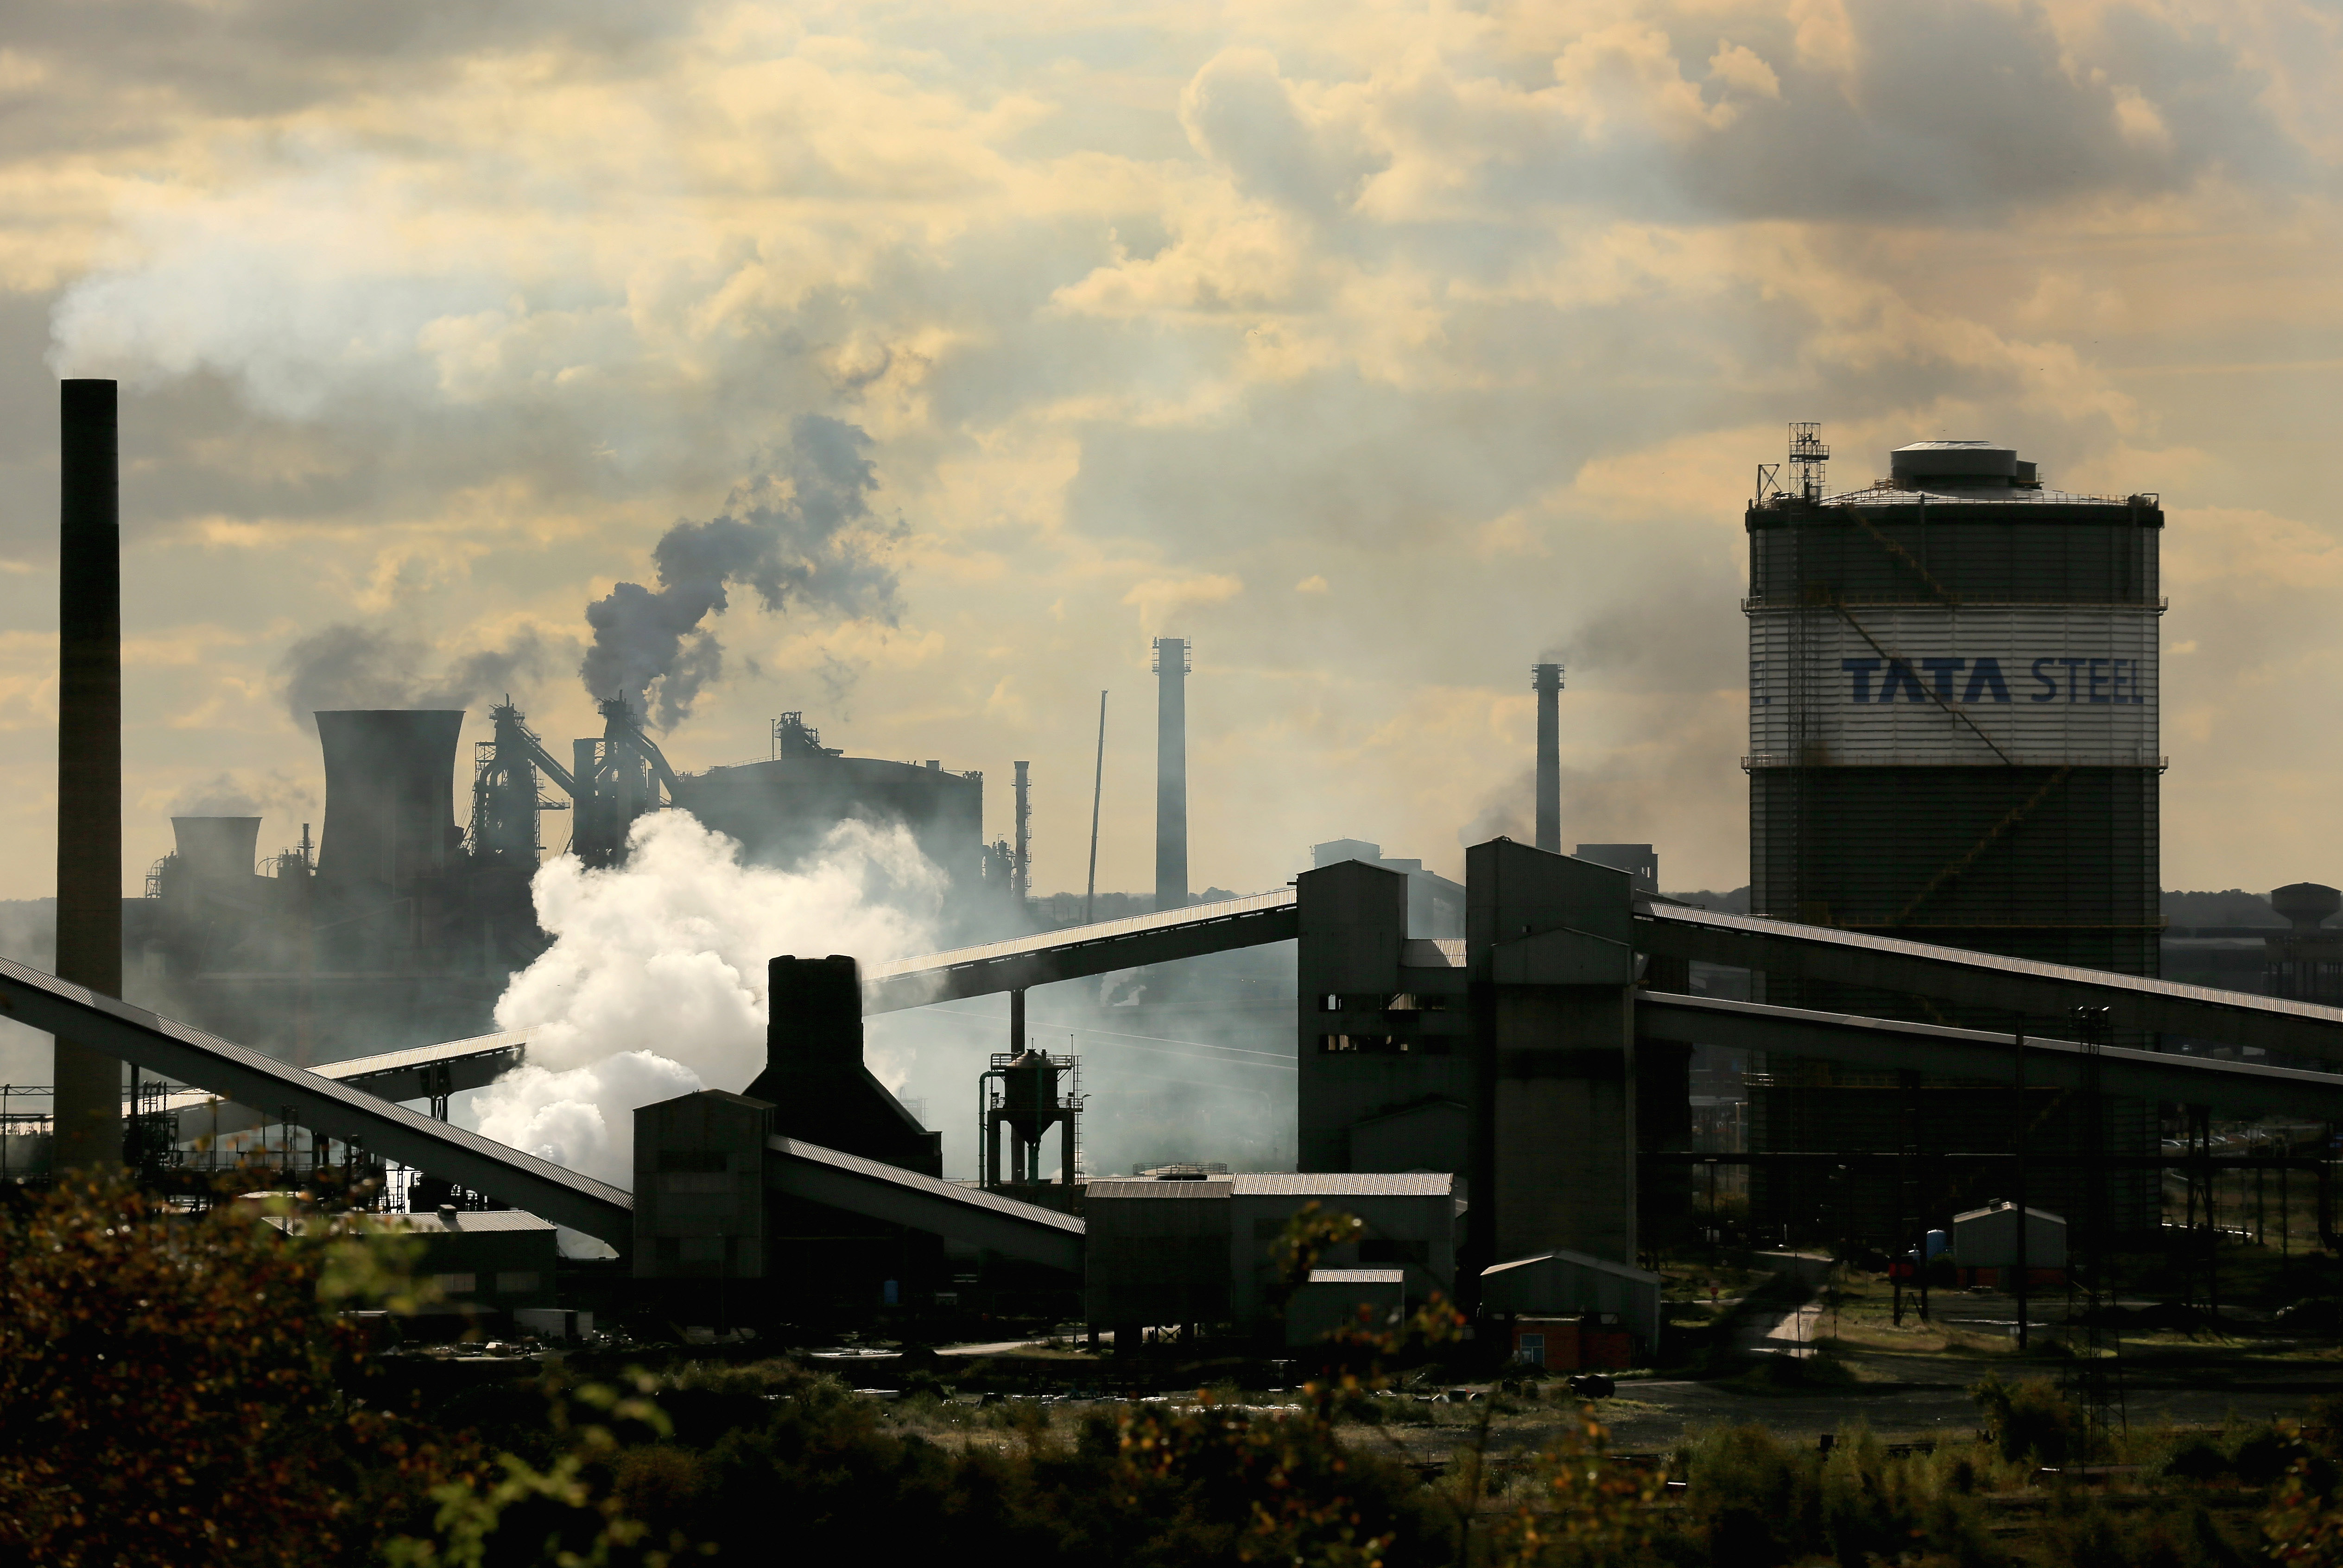 High energy prices 'threaten British steelmaking industry'